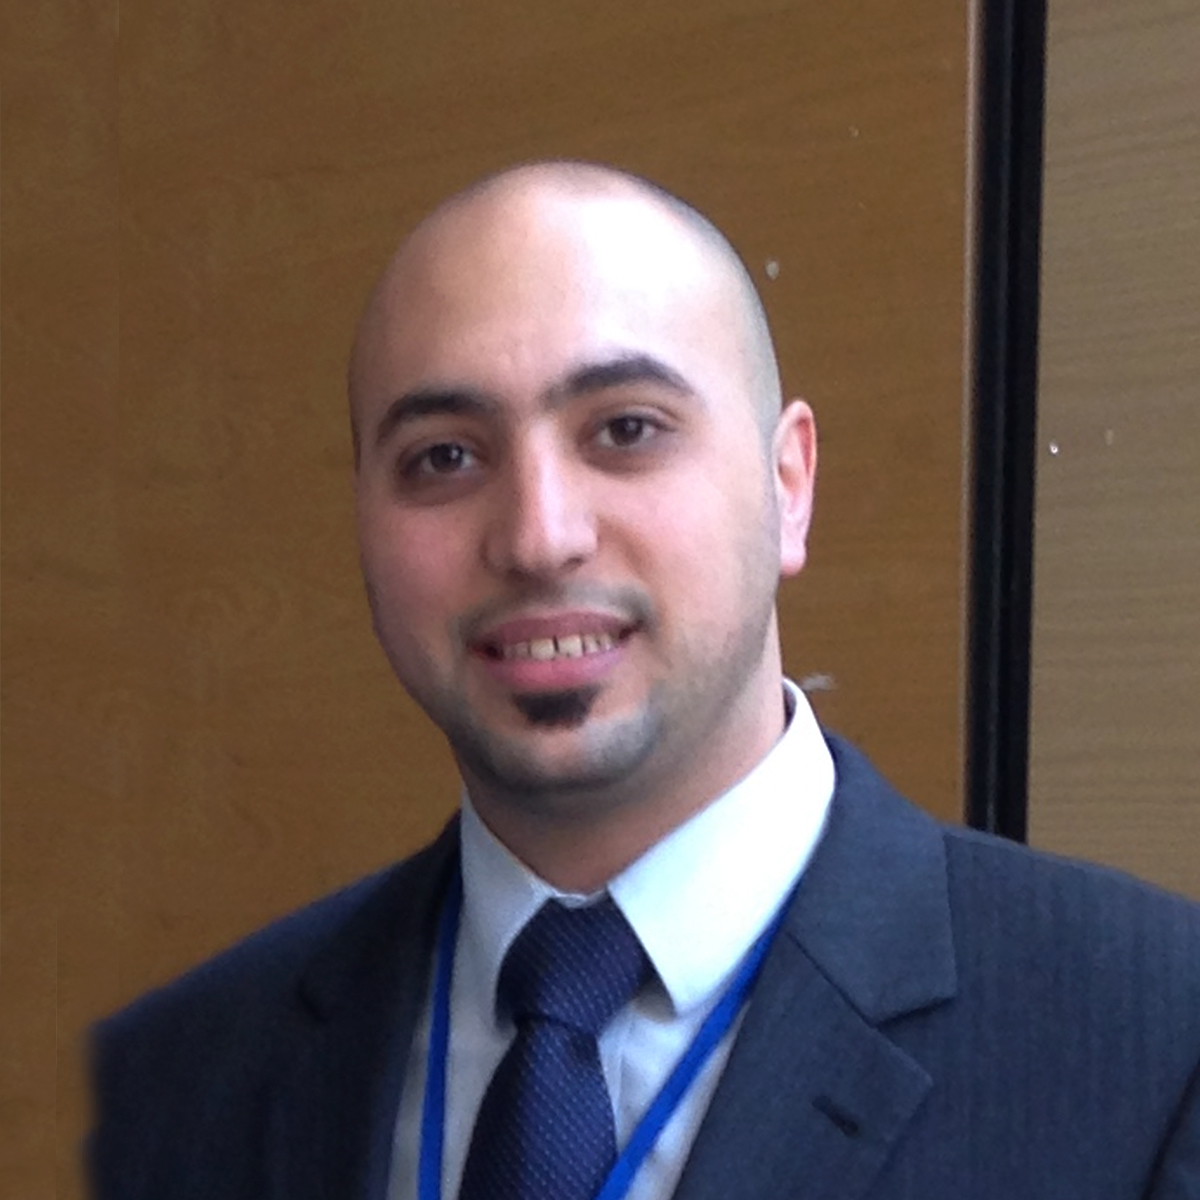 Mohammad Alsawwaf